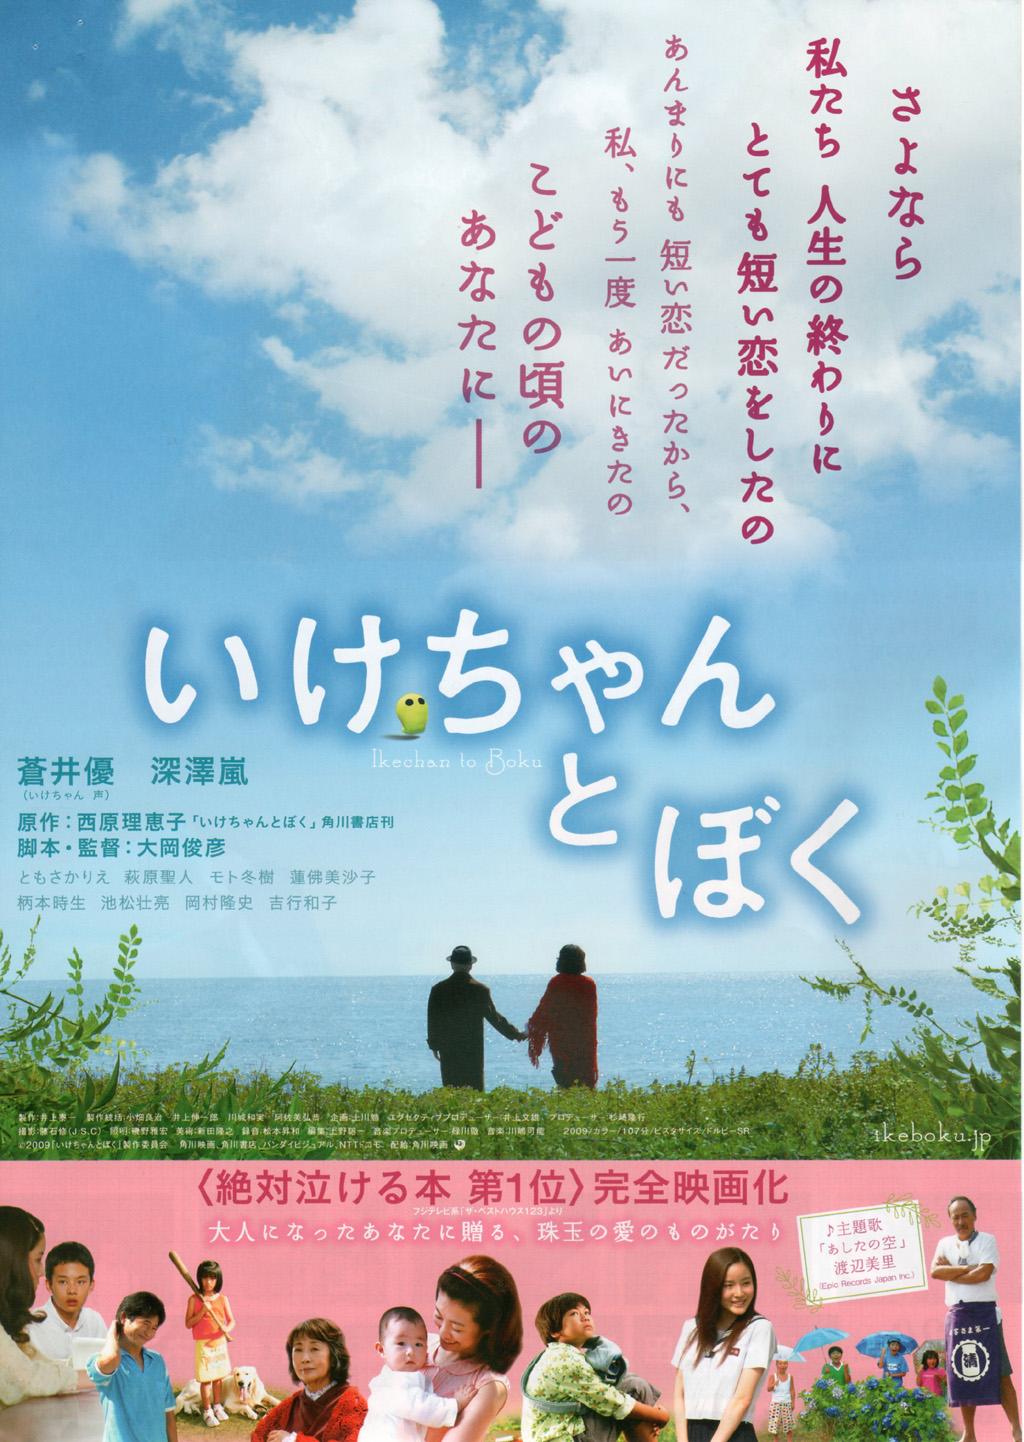 ON AIR#1260 いけちゃんとぼく (2009 日本 107分 7/04 新宿三丁目 角川シネマ新宿)